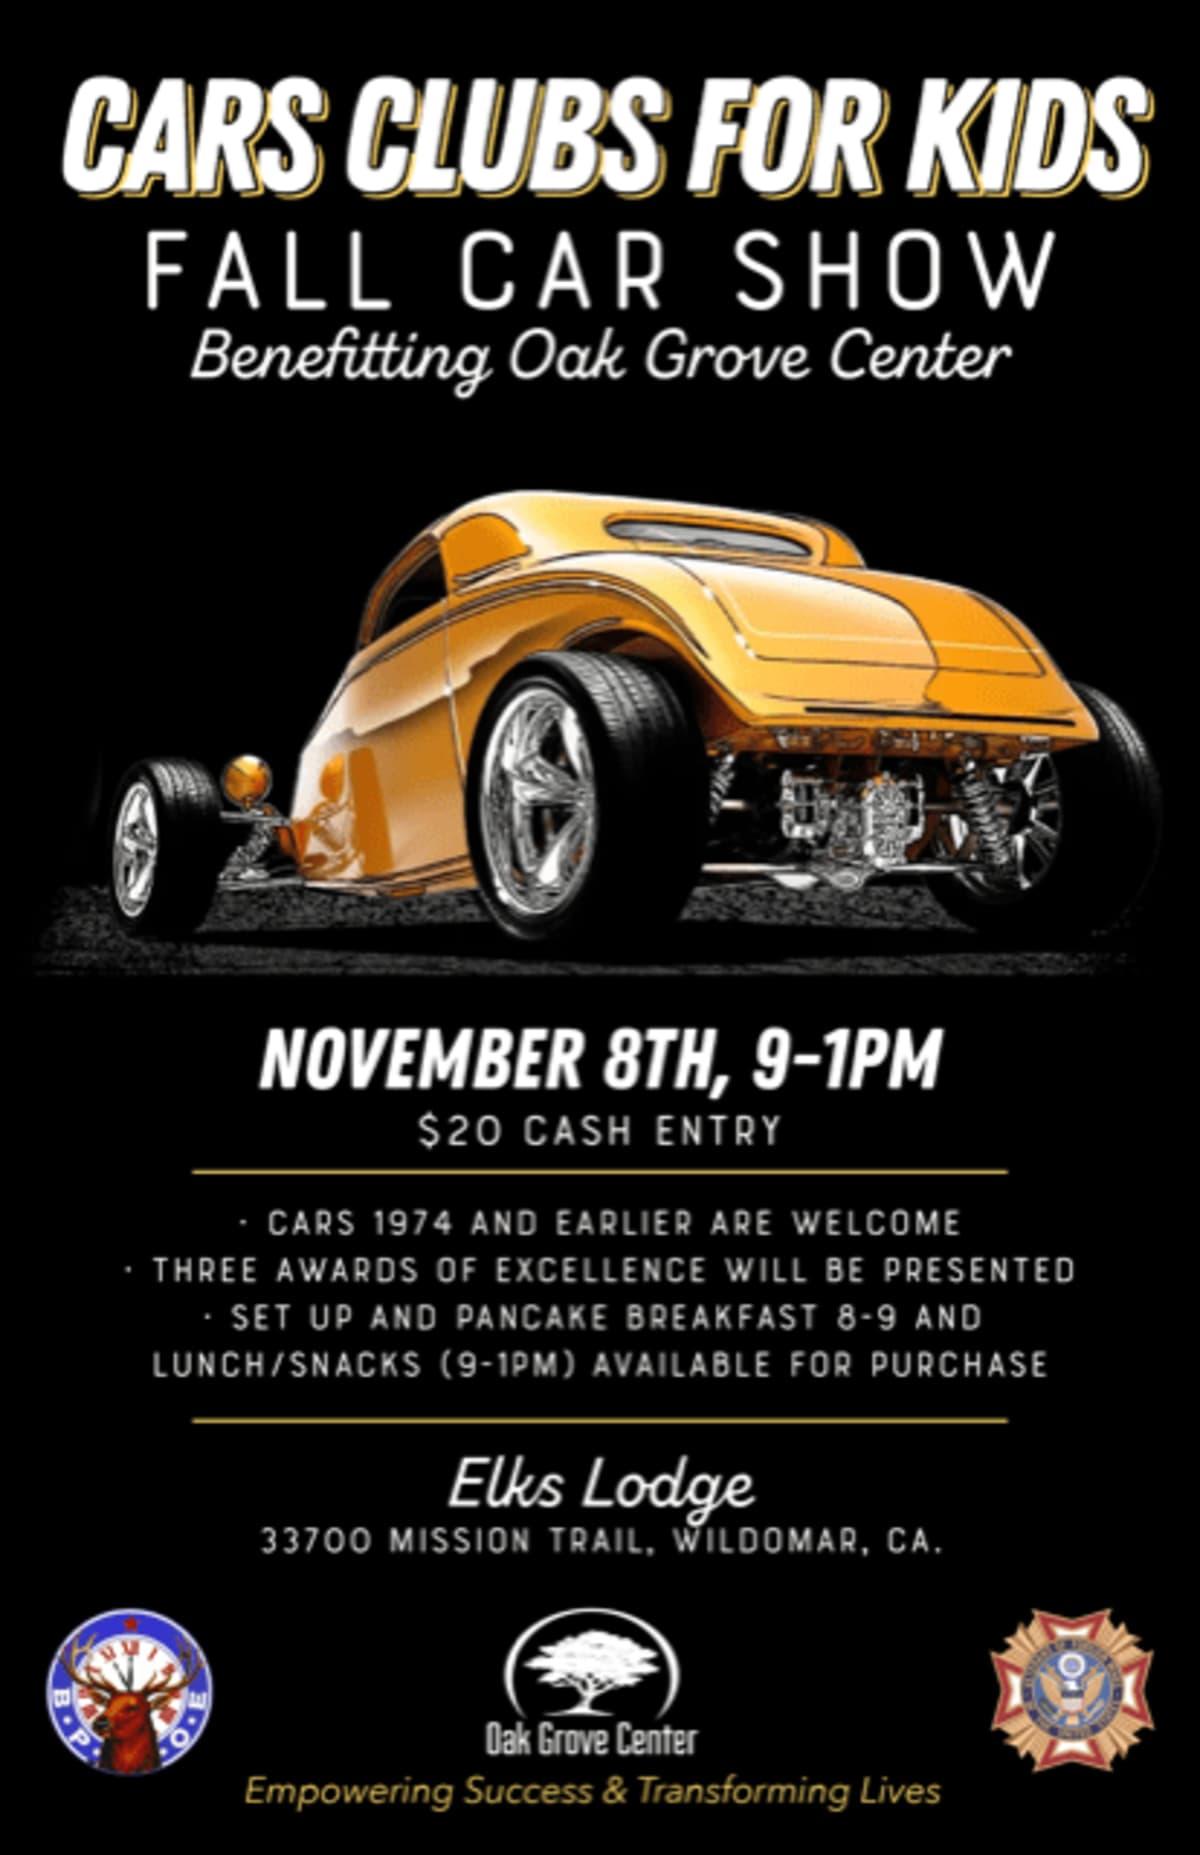 Car Clubs for Kids Fall Car Show